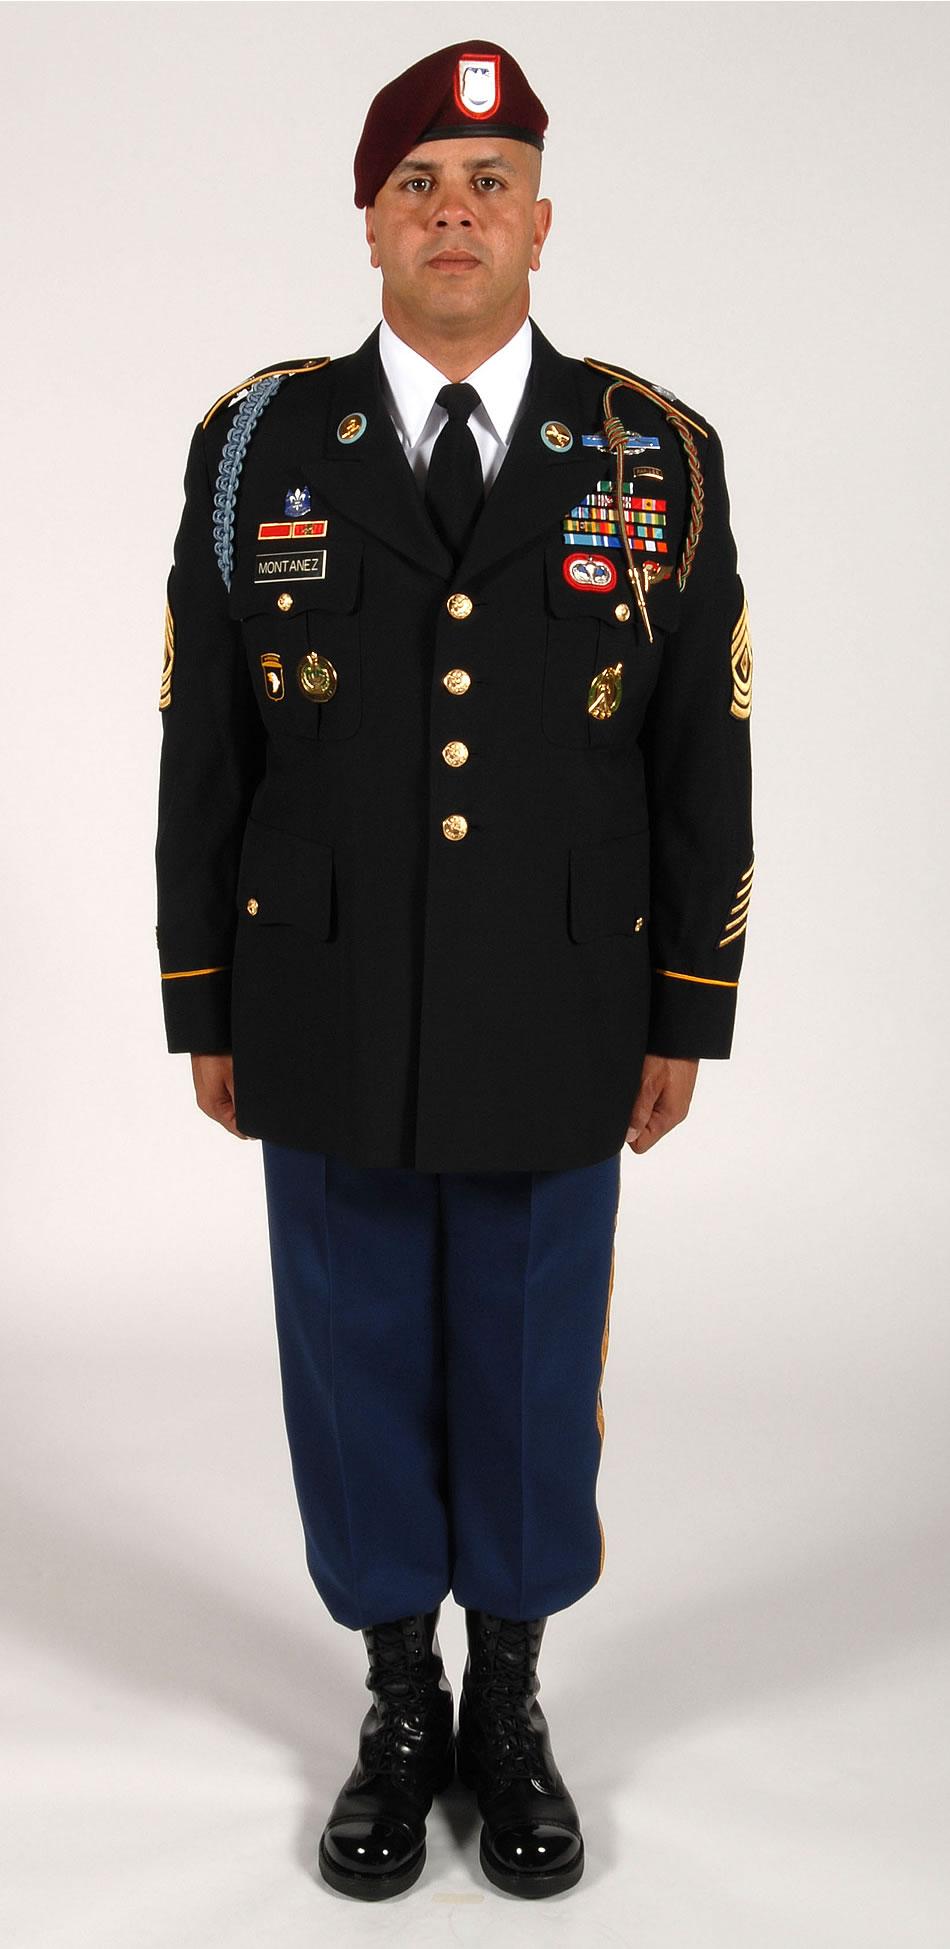 Military Photo New Army Dress Blue Uniform